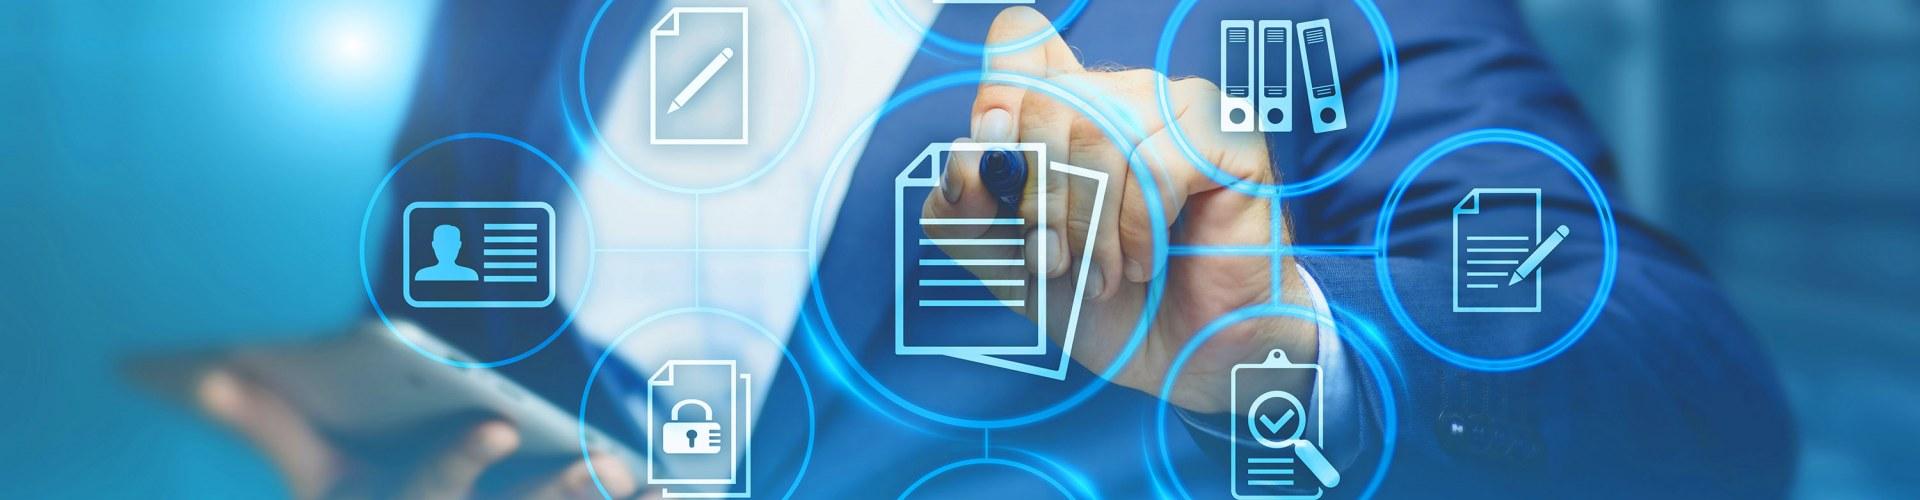 Ingenieurbüro Planungsbüro IT Services Informationsmanagement